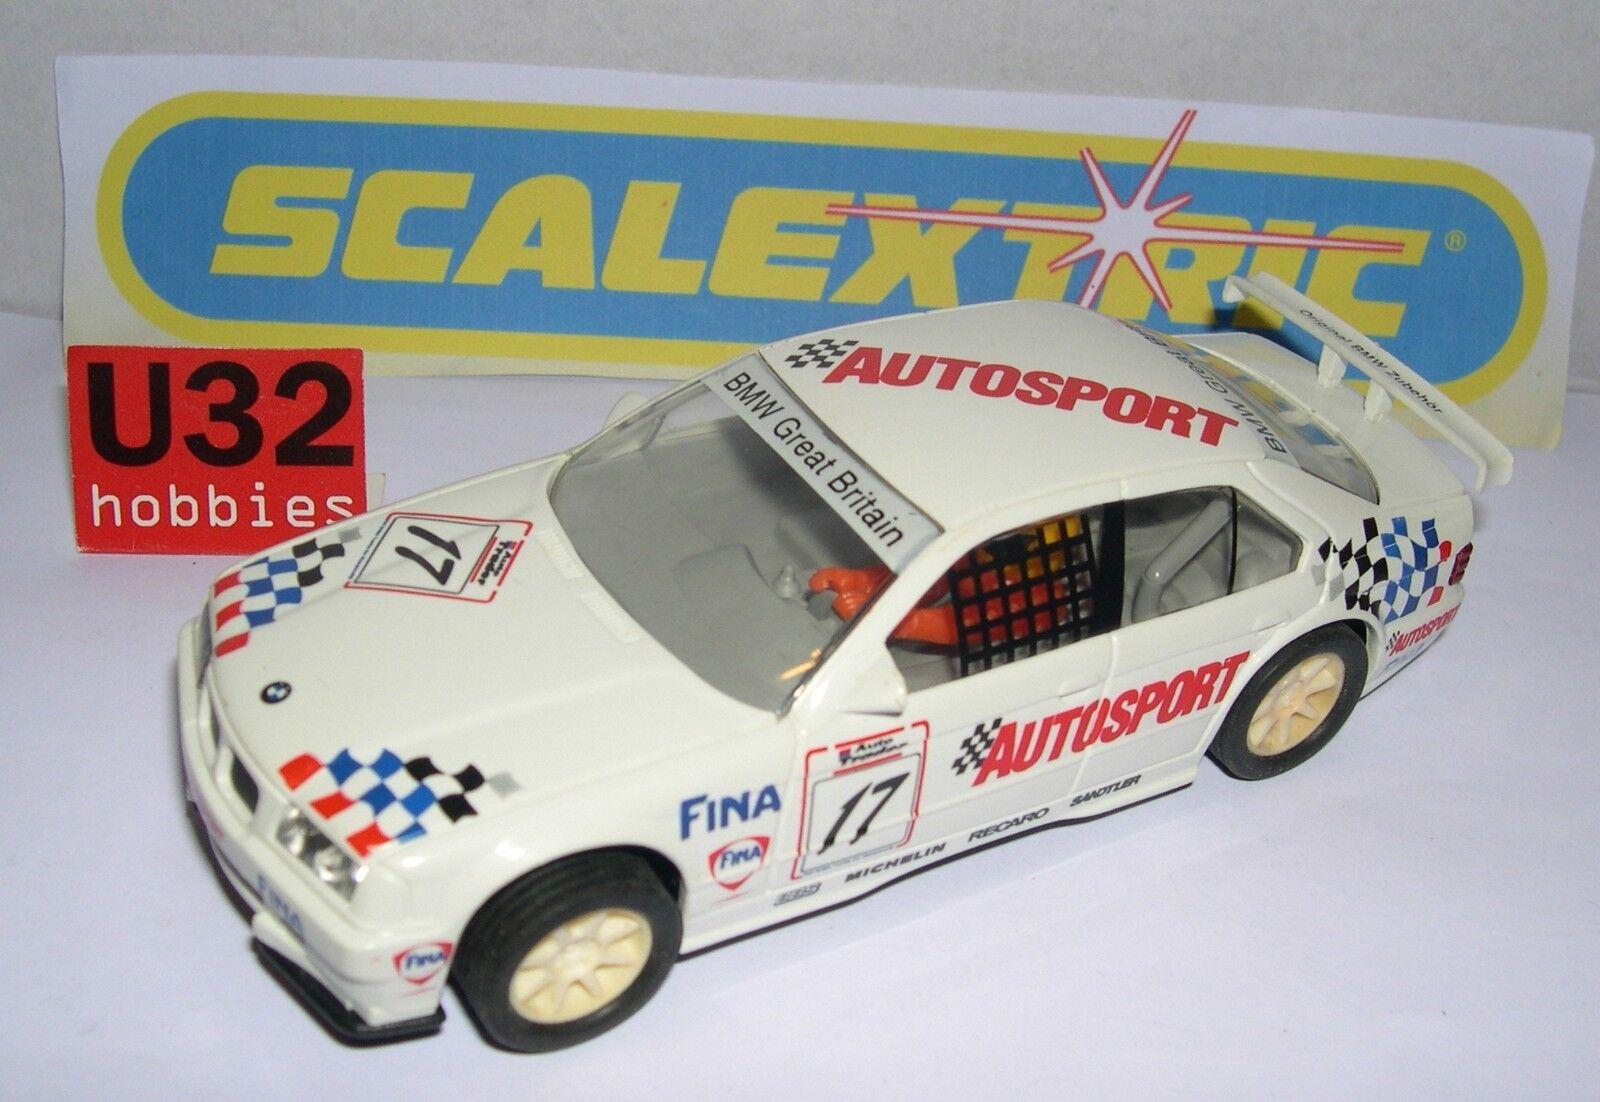 SCALEXTRIC BMW 318I  17 AUTOSPORT ONLY SET C-673 MINT UNBOXED